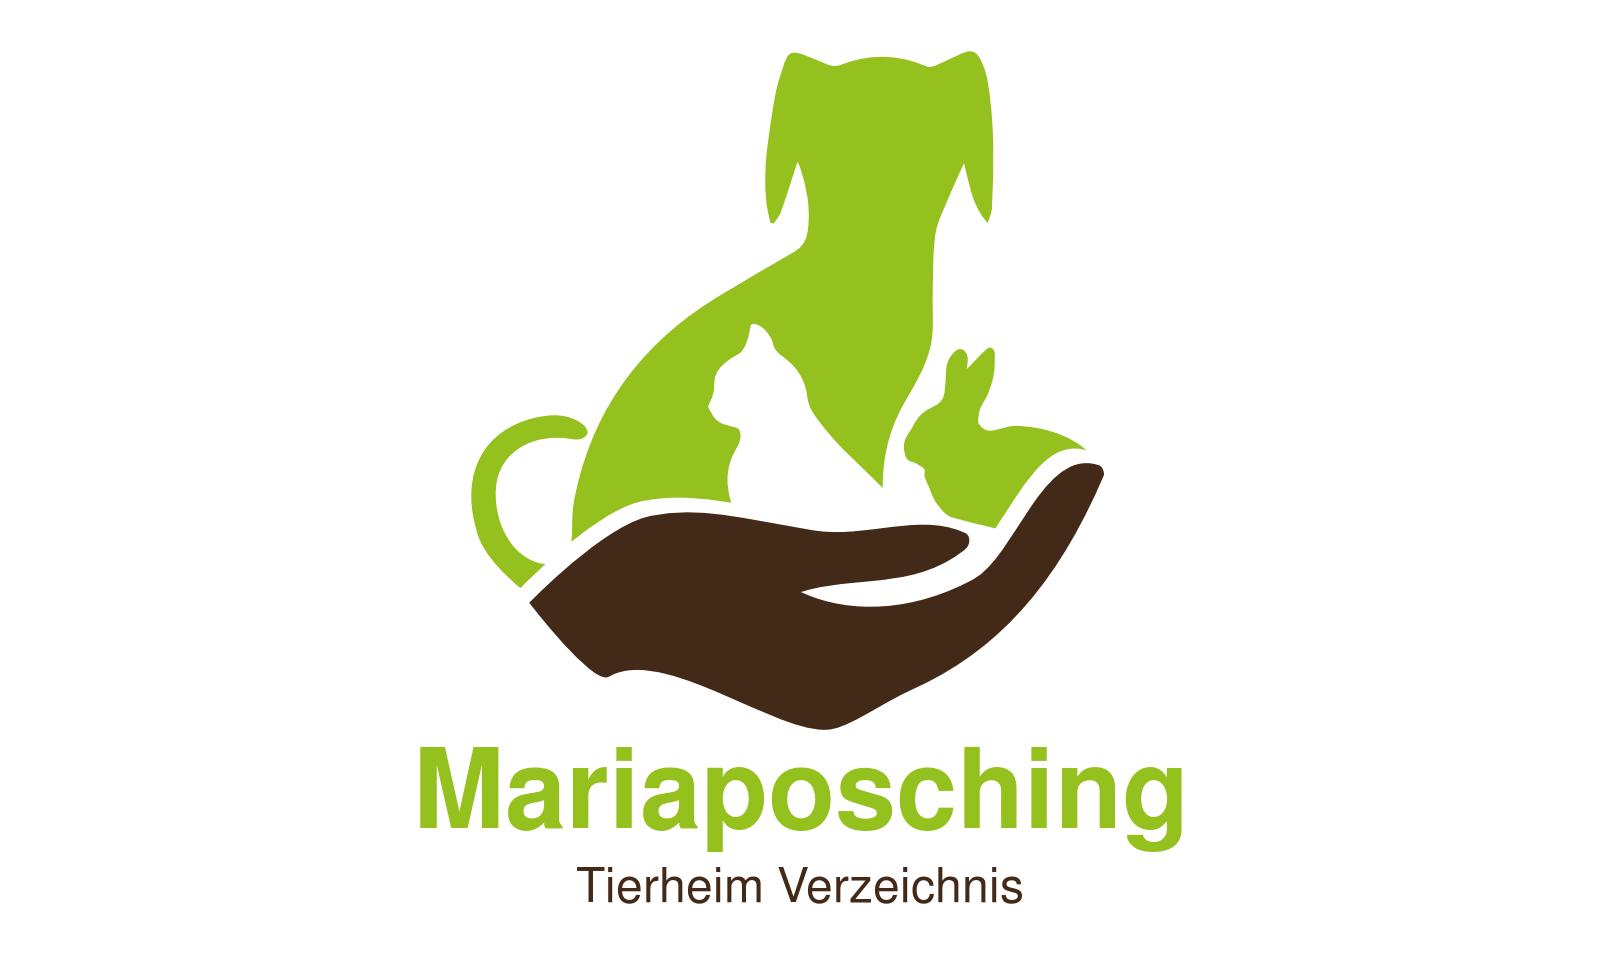 Tierheim Mariaposching